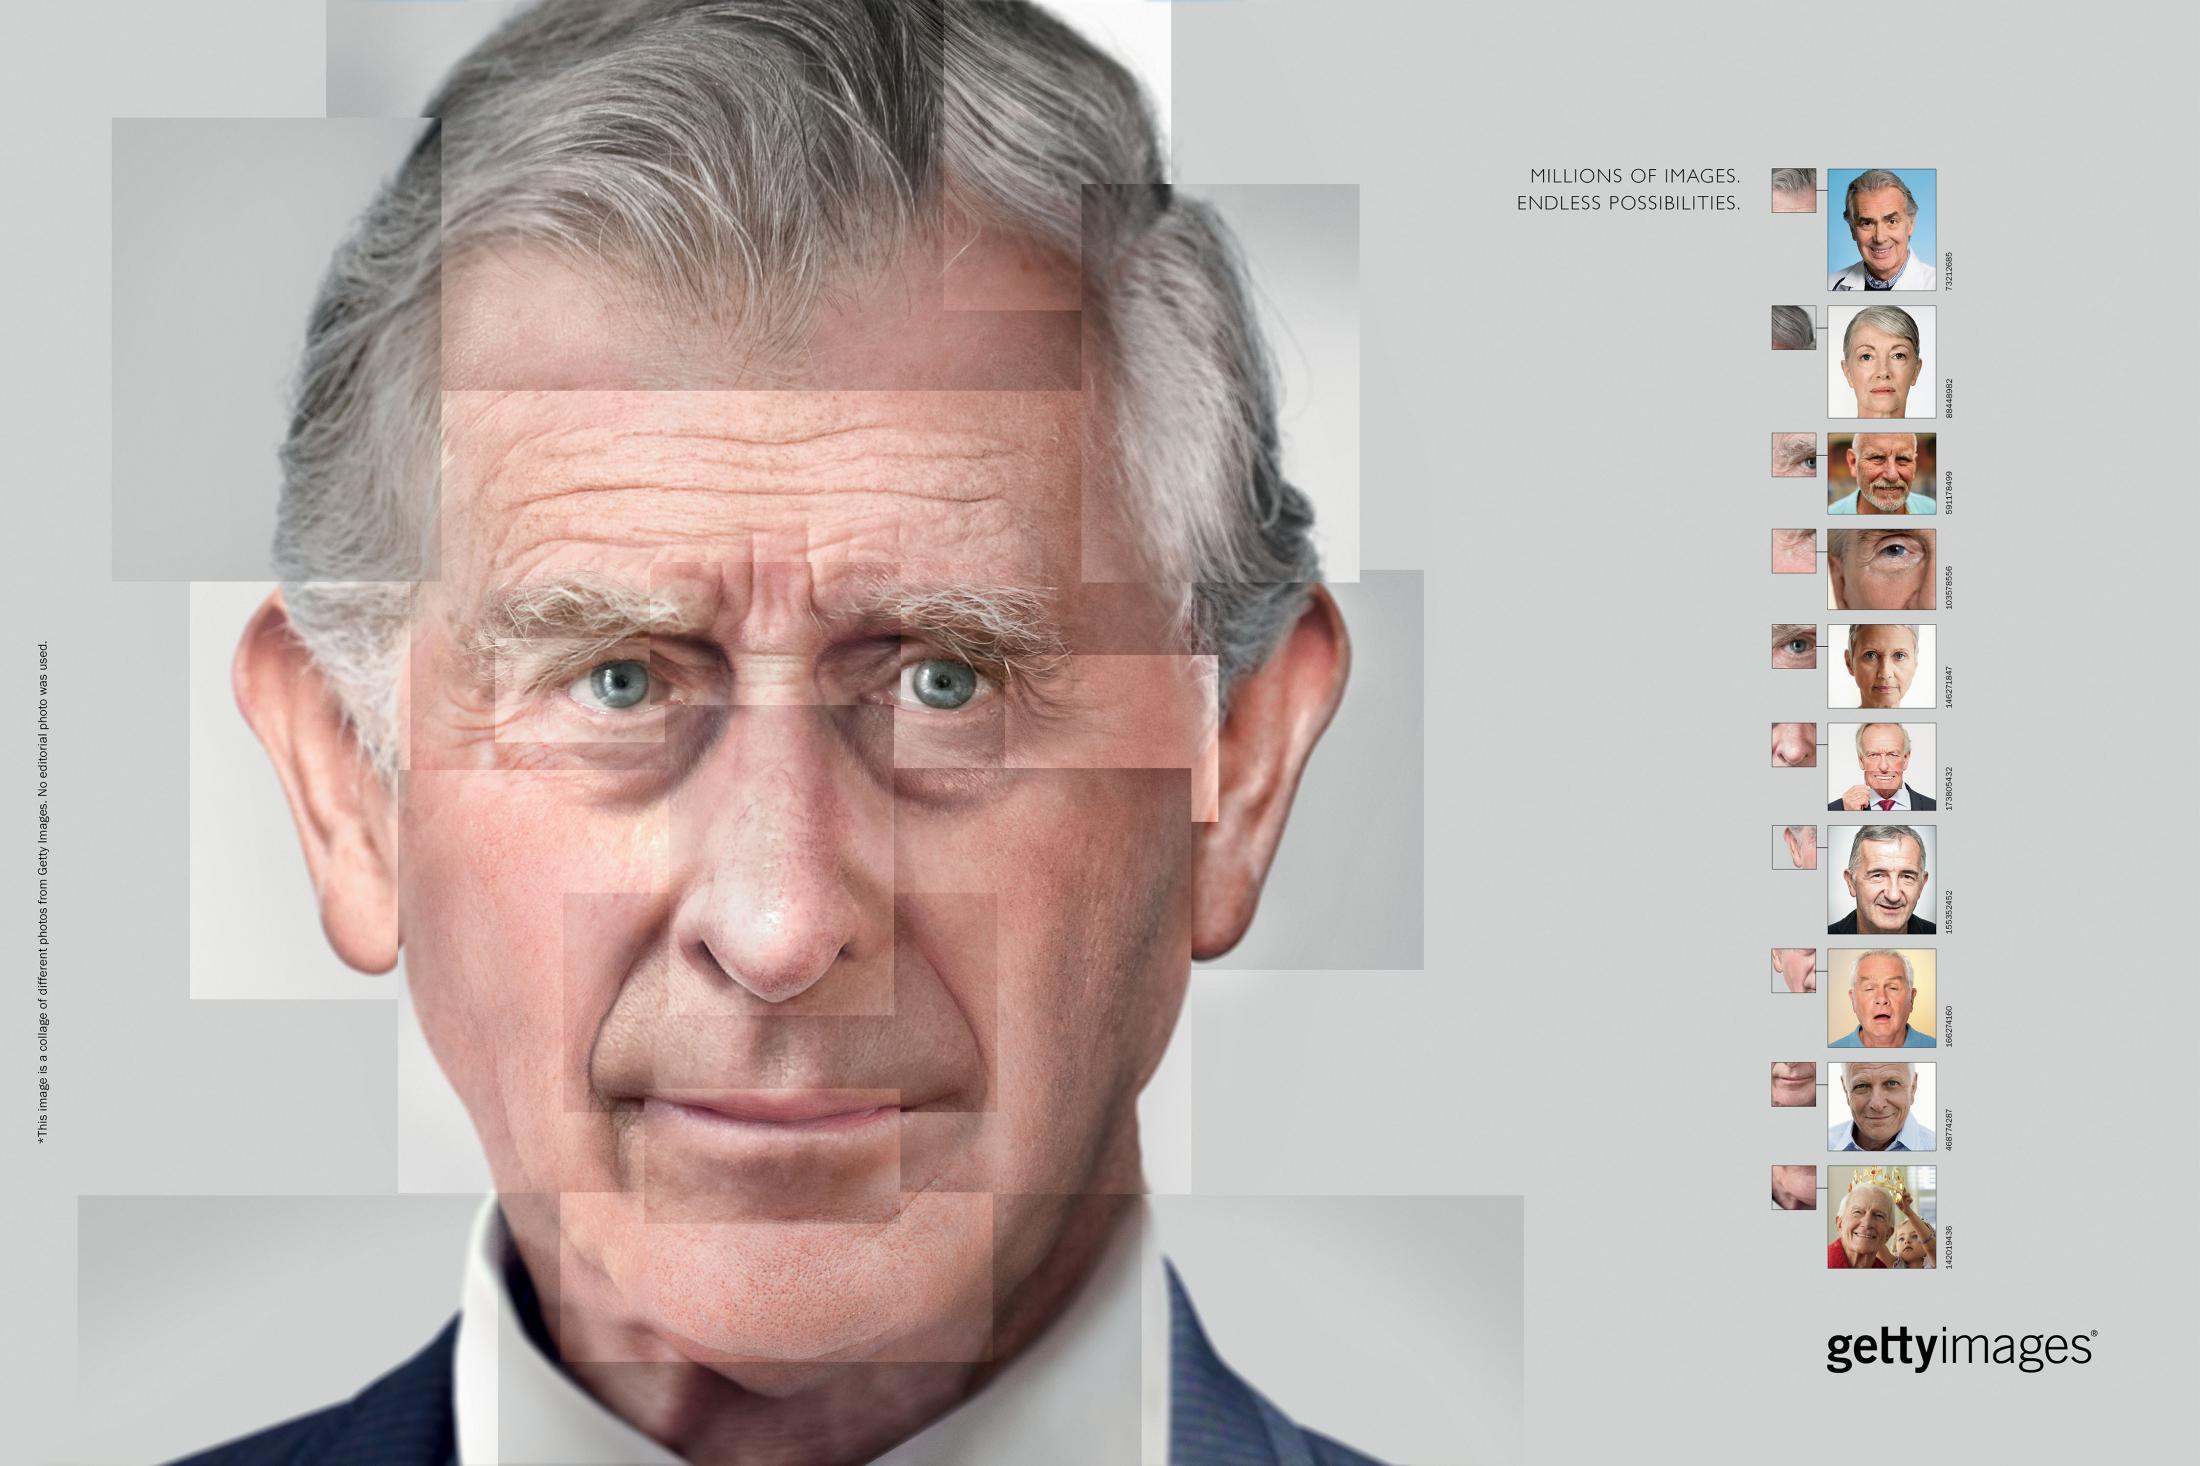 Thumbnail for Charles